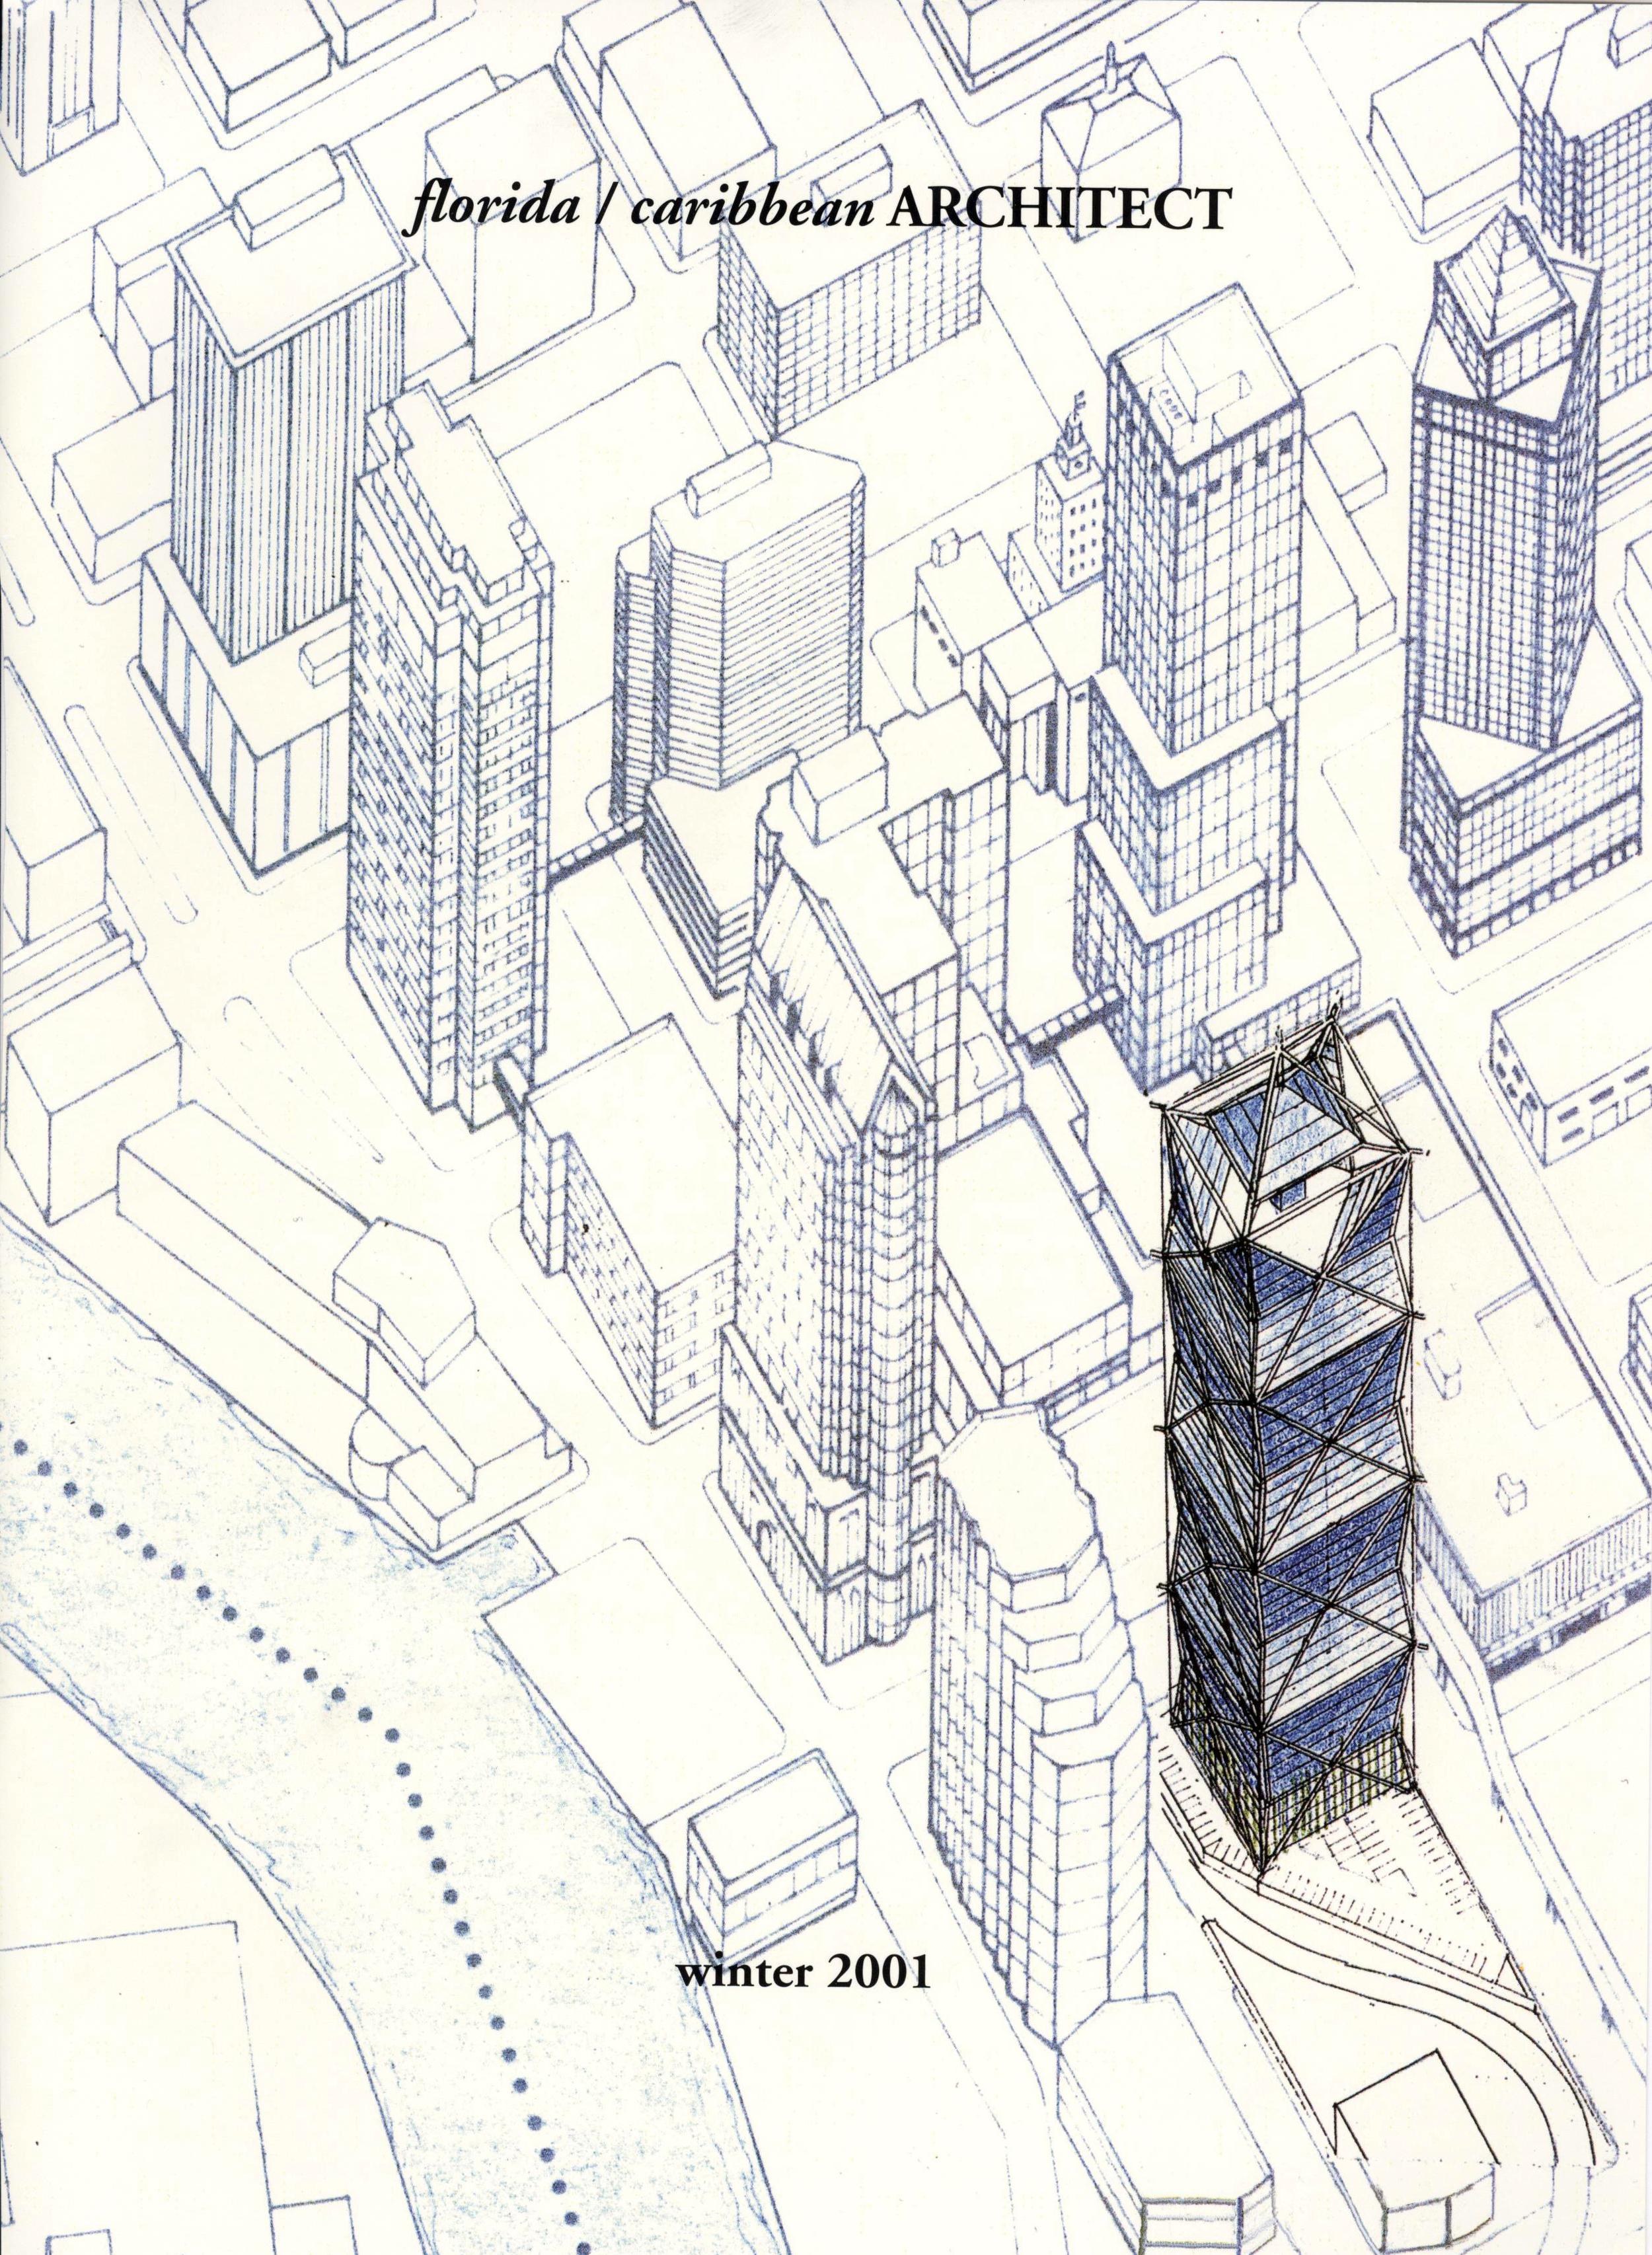 Florida Architect 2001 (Publications) 001 SC-11.jpg